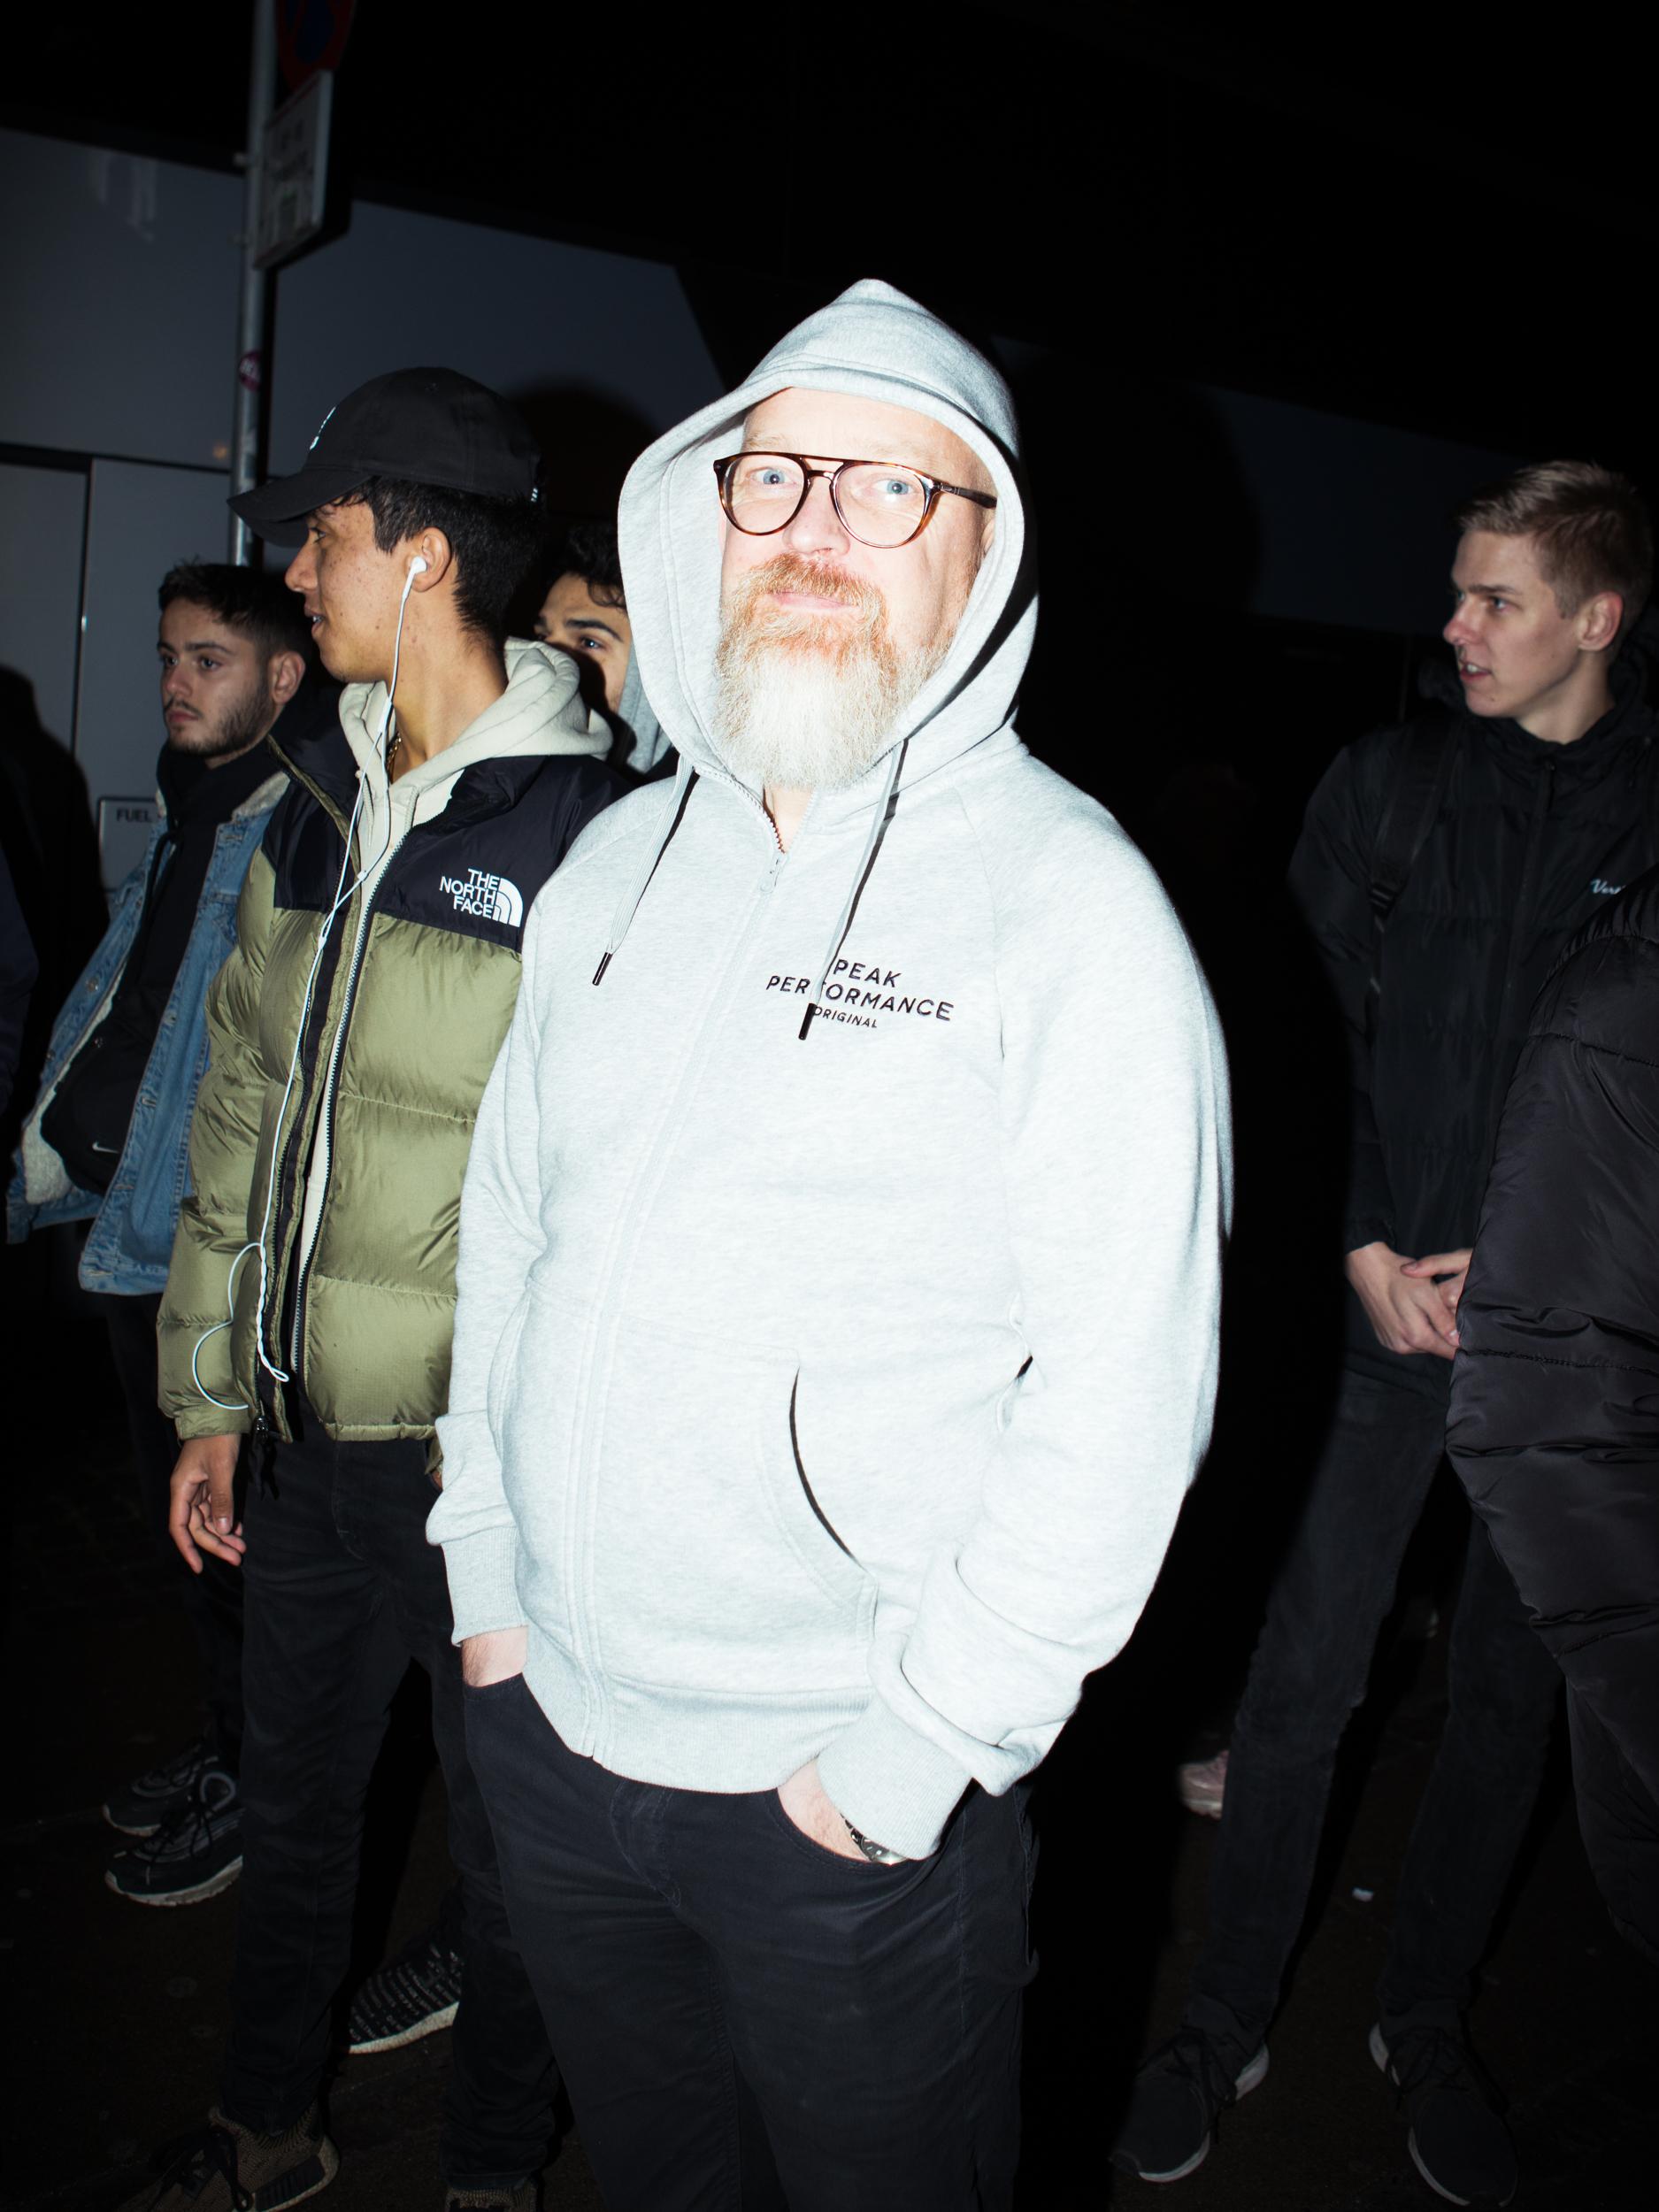 Dansk fan til Lil Pump i Vega 2018